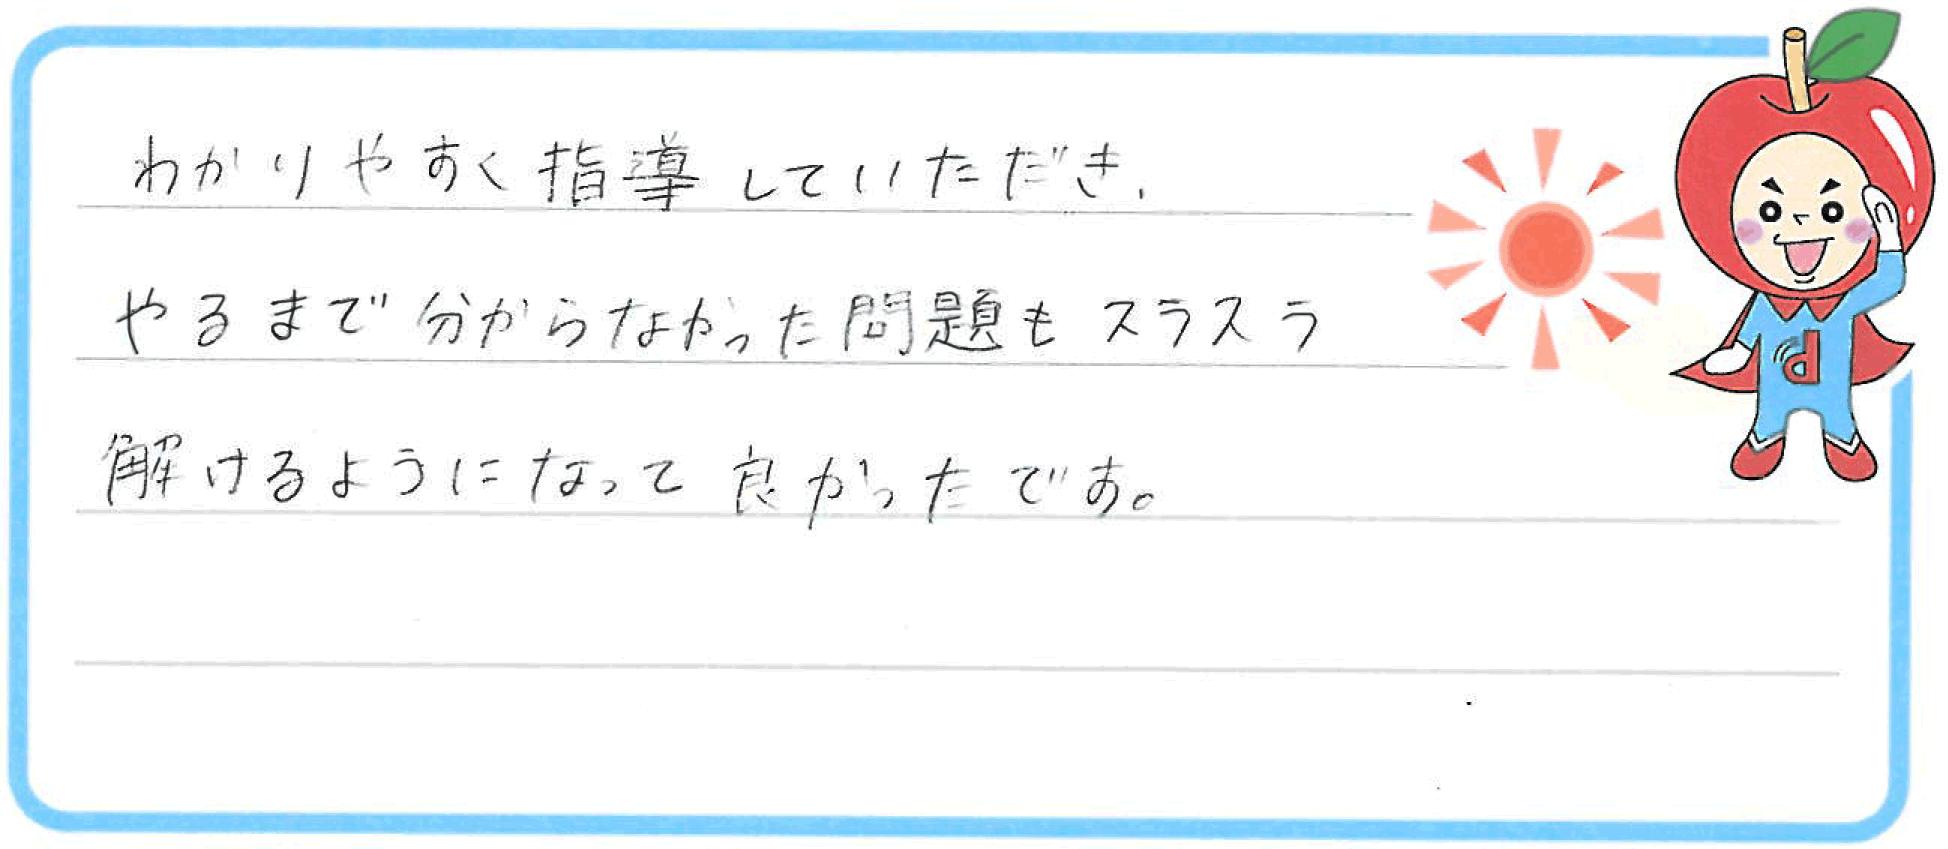 Eちゃん(七尾市)からの口コミ